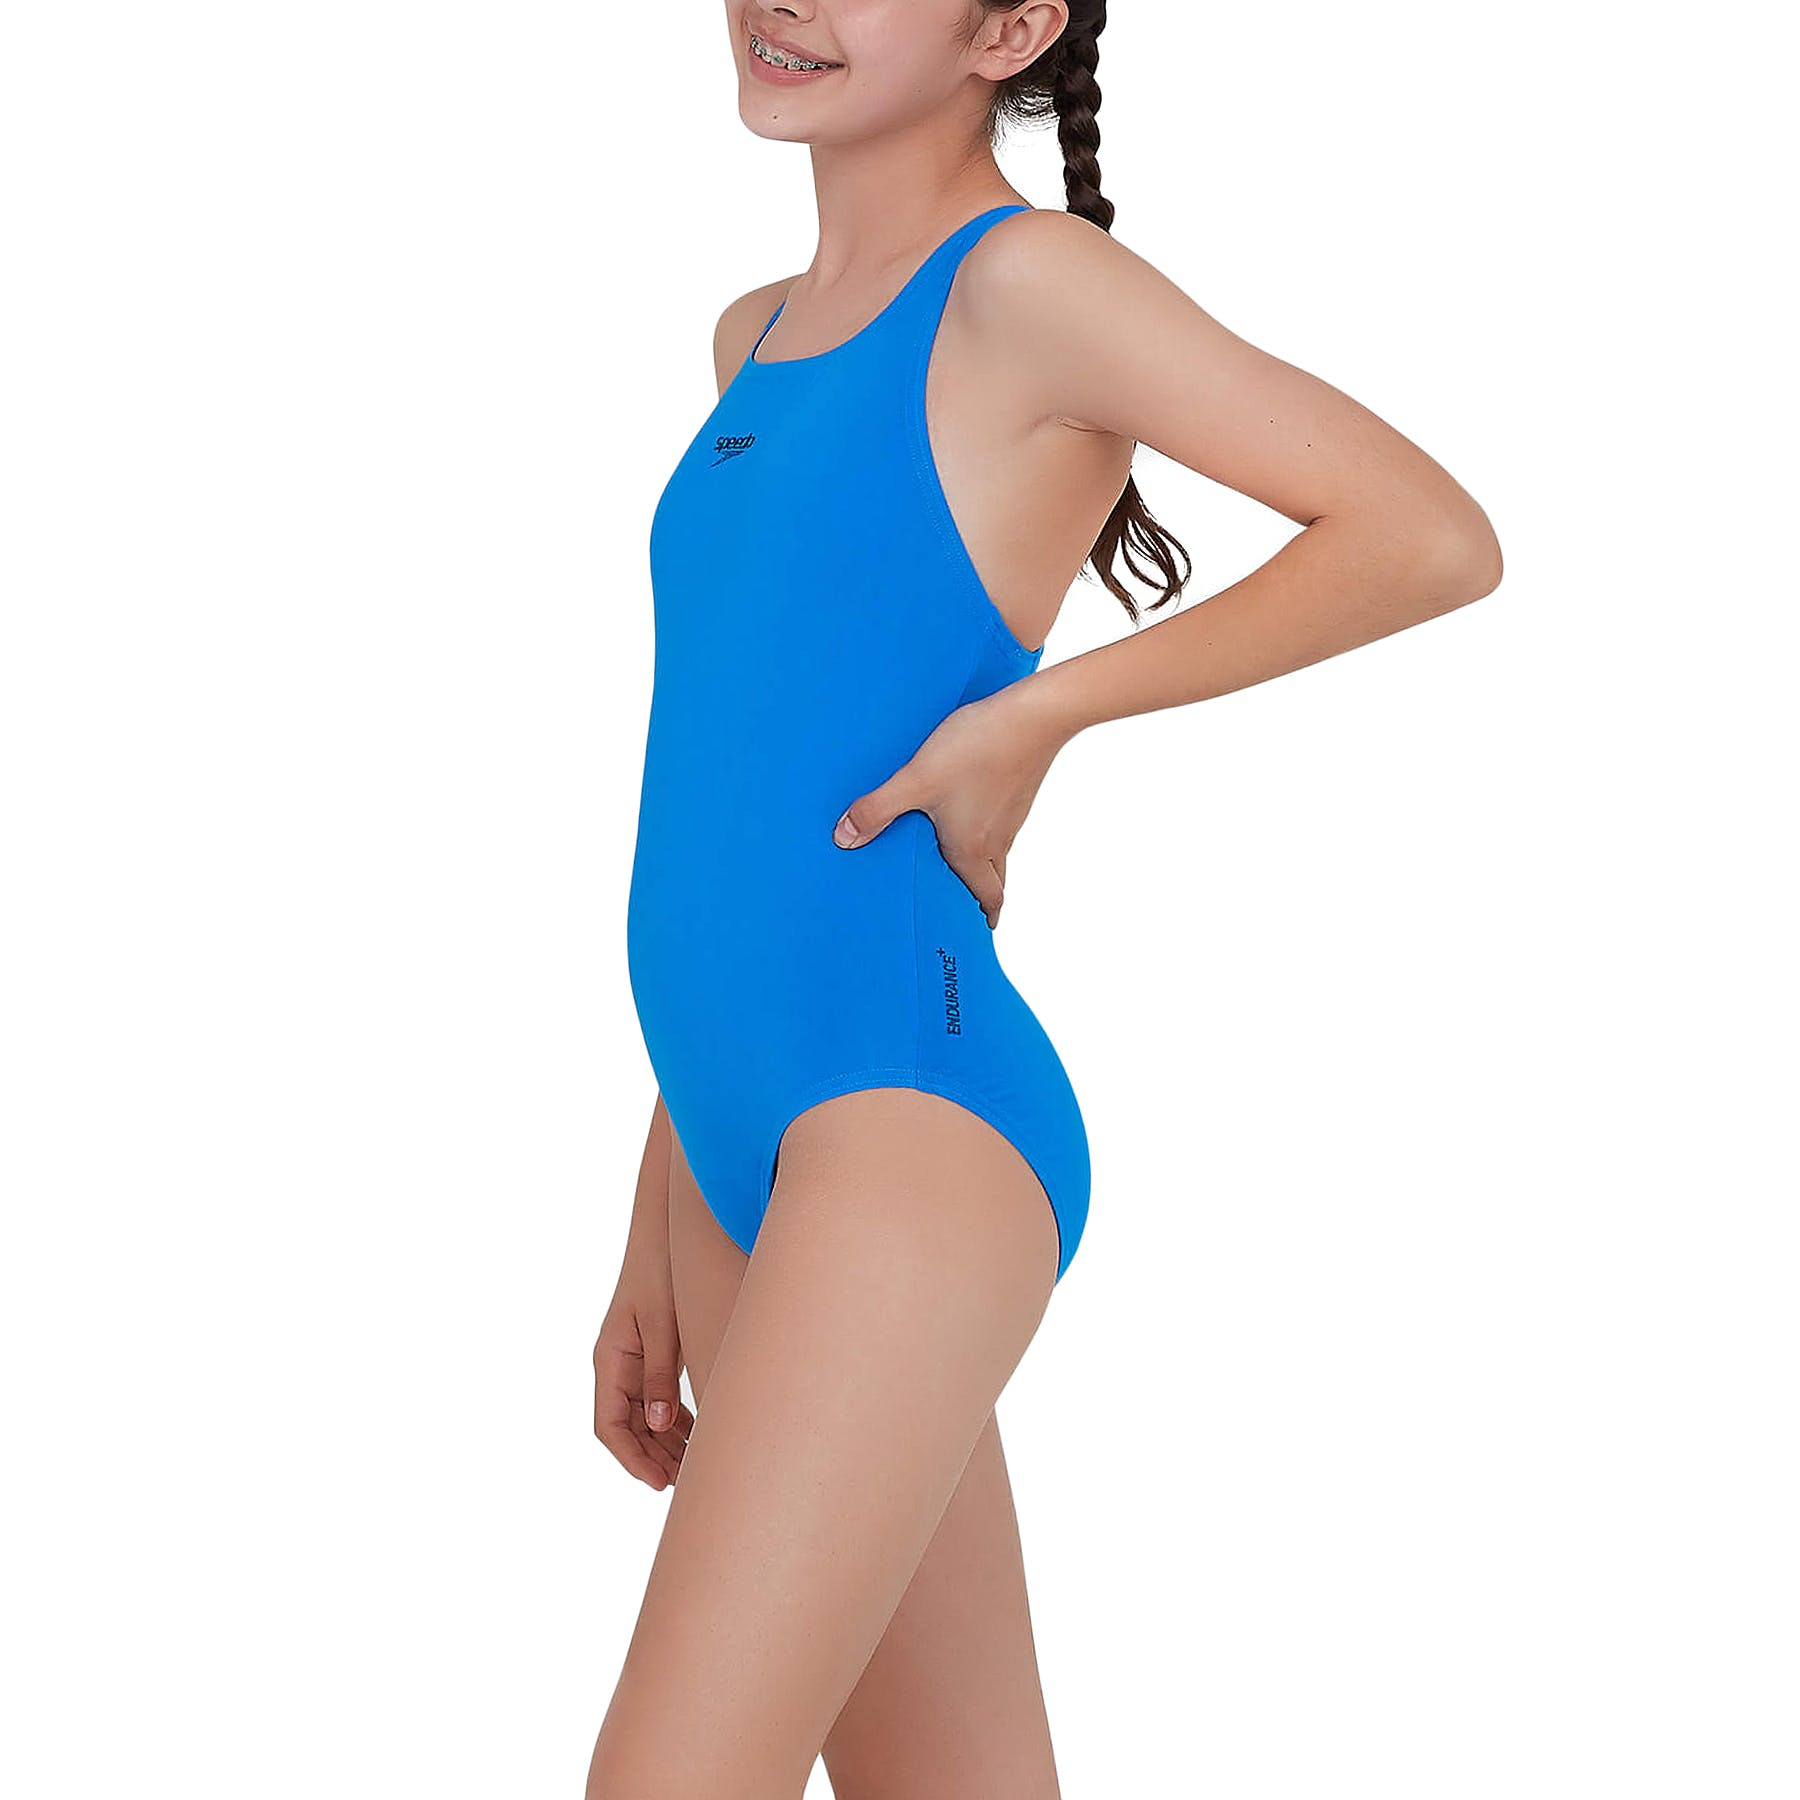 1PC NEW SPEEDO Girls Essential Medalist Op Light Jade Aqua Size 5 Endurance